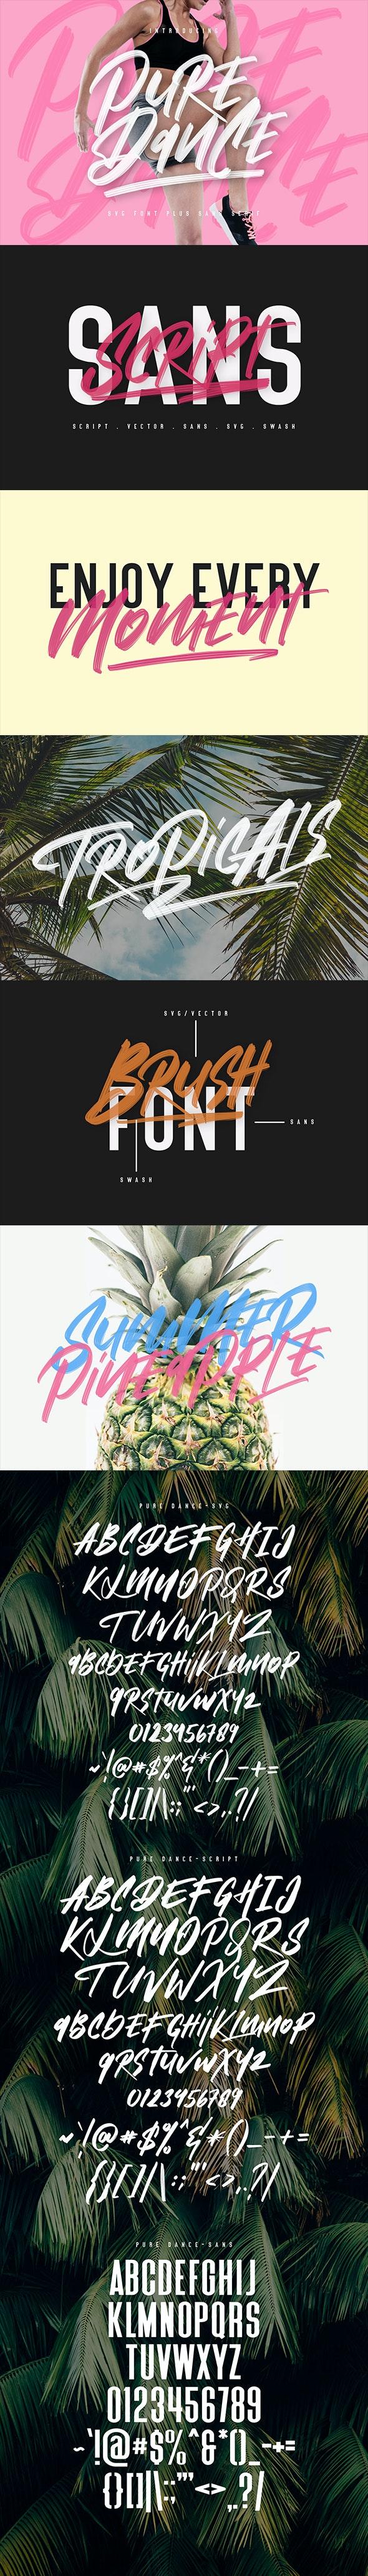 Pure Dance Brush Font - Hand-writing Script